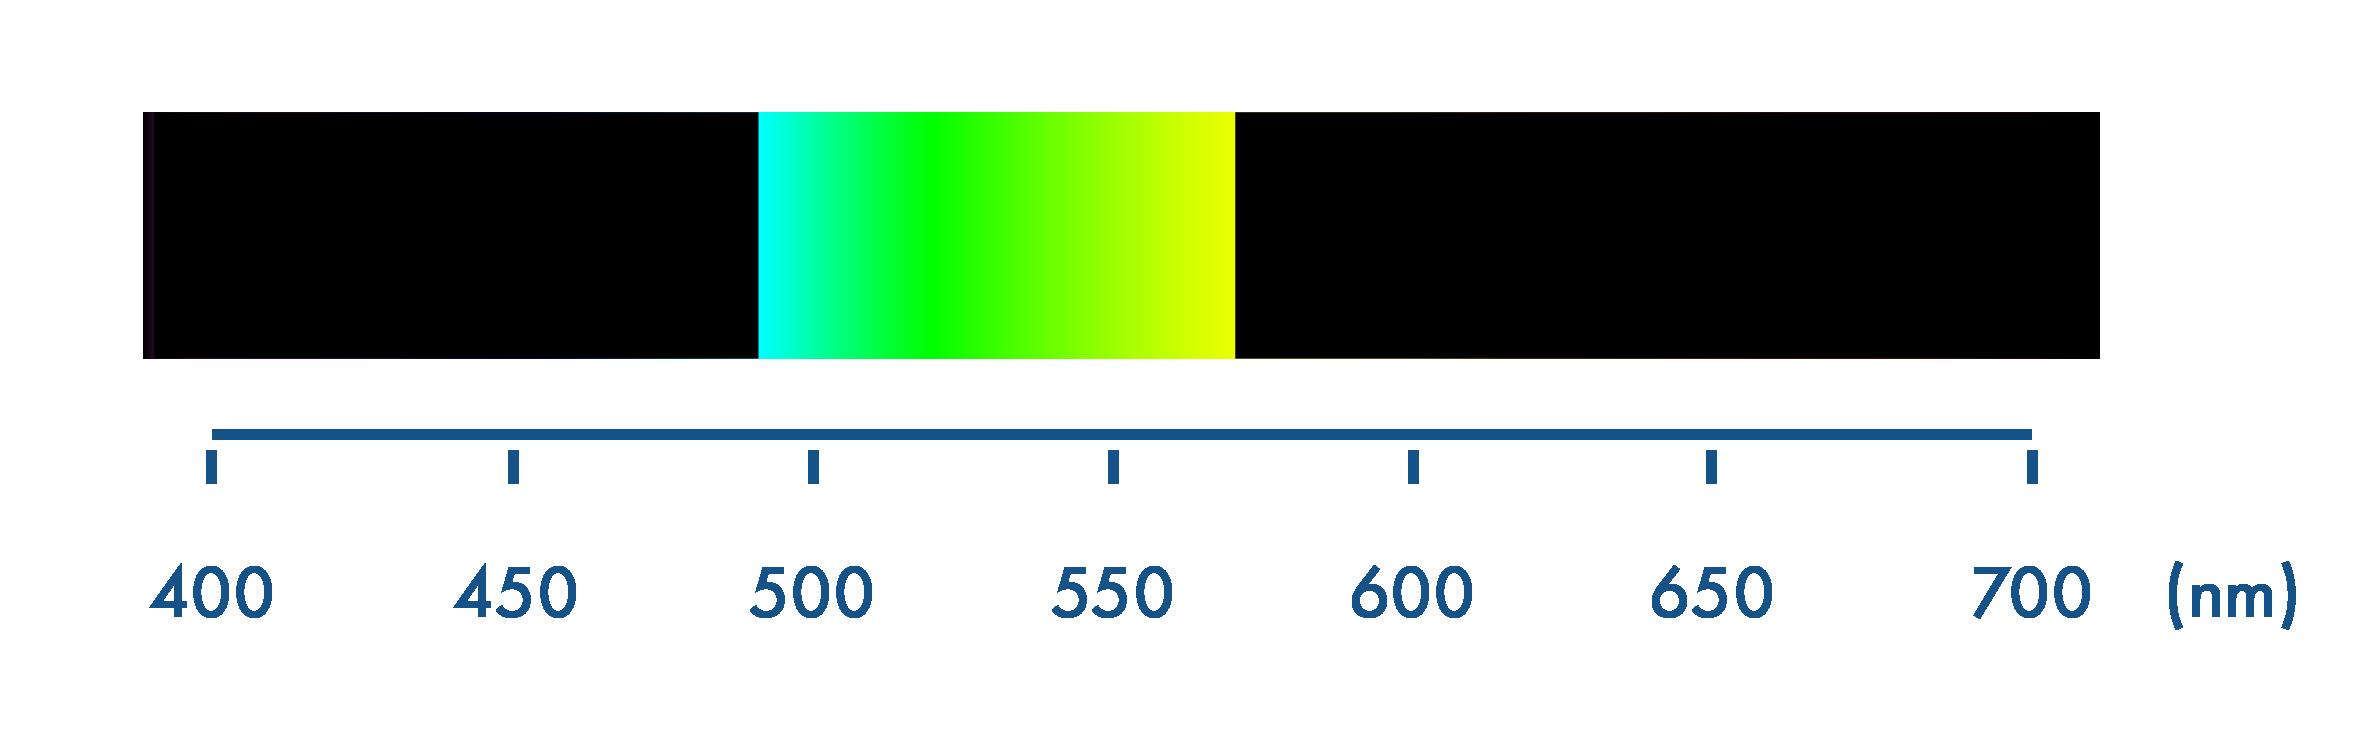 Vert polychromatique